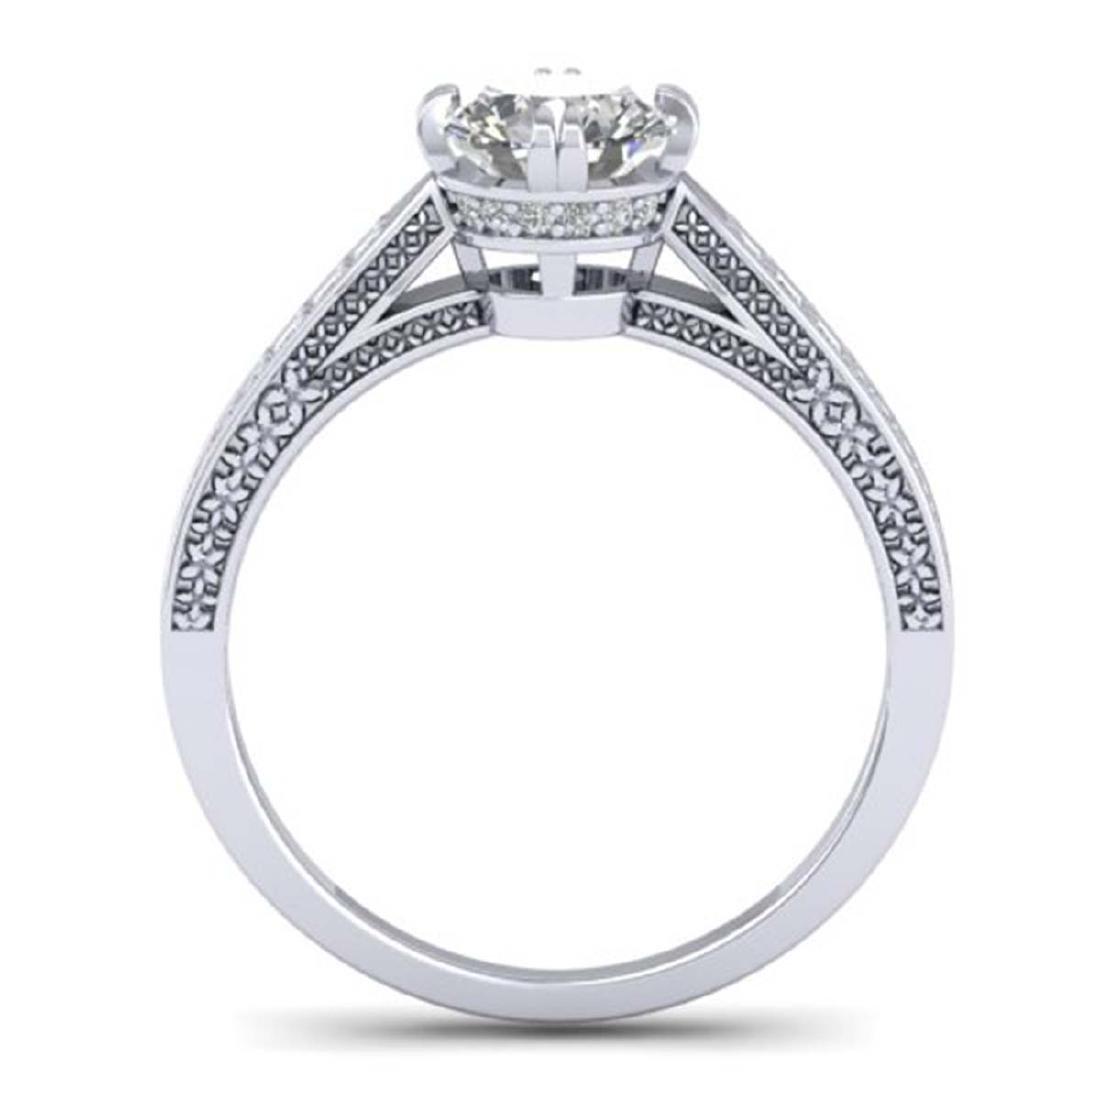 1.22 CTW Certified VS/SI Diamond Solitaire Art Deco - 3